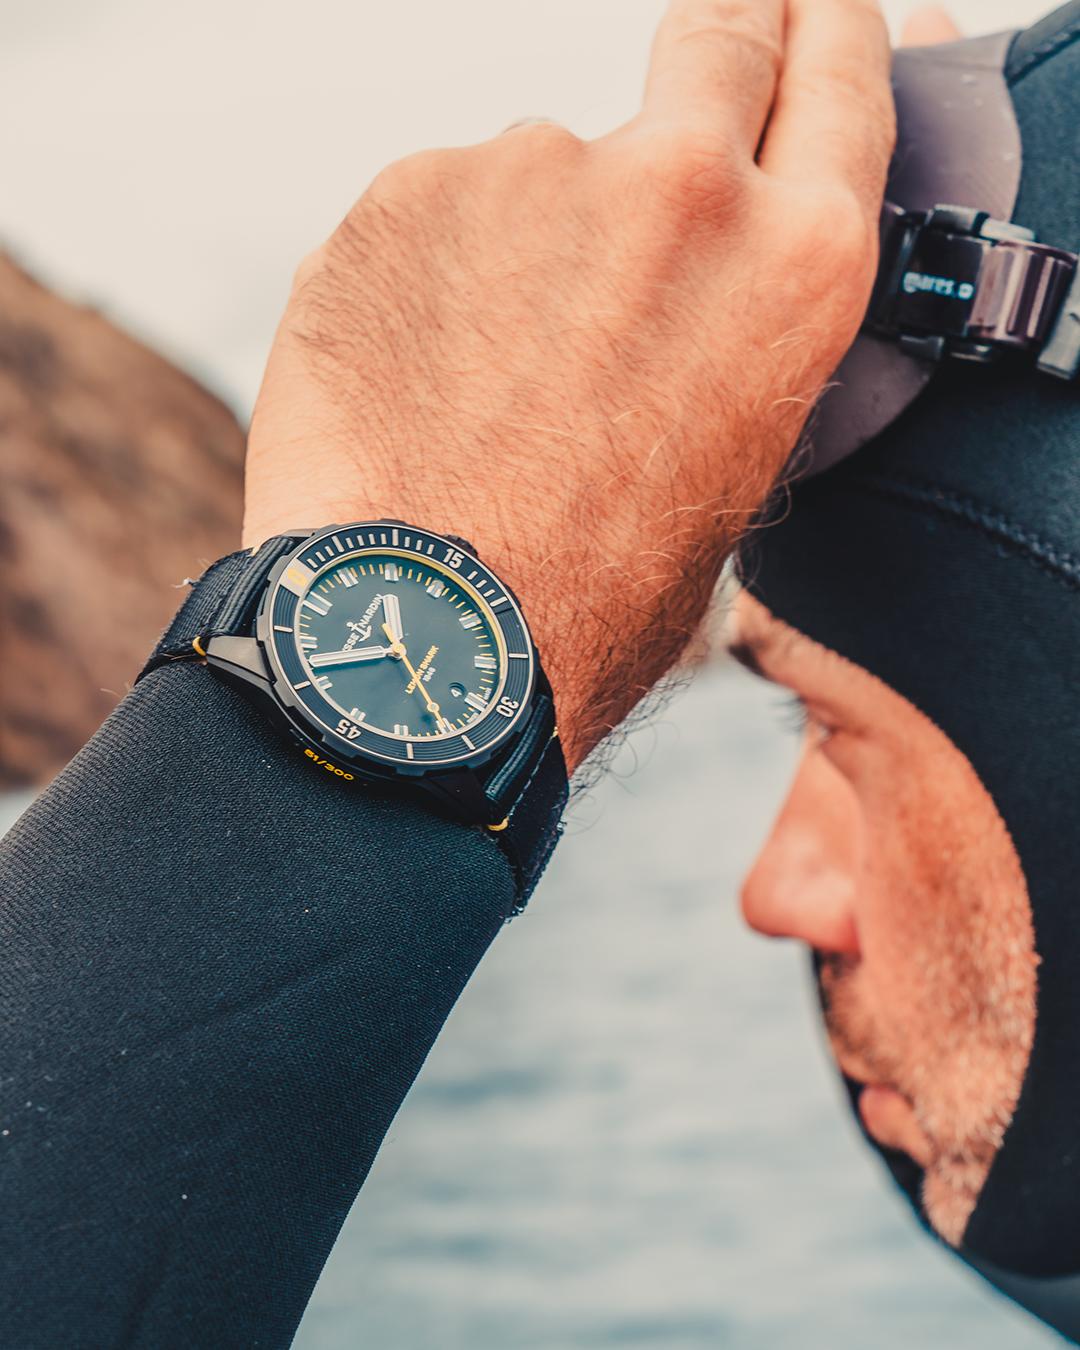 Diver Lemon Shark Mezger Uhren und Juwelen